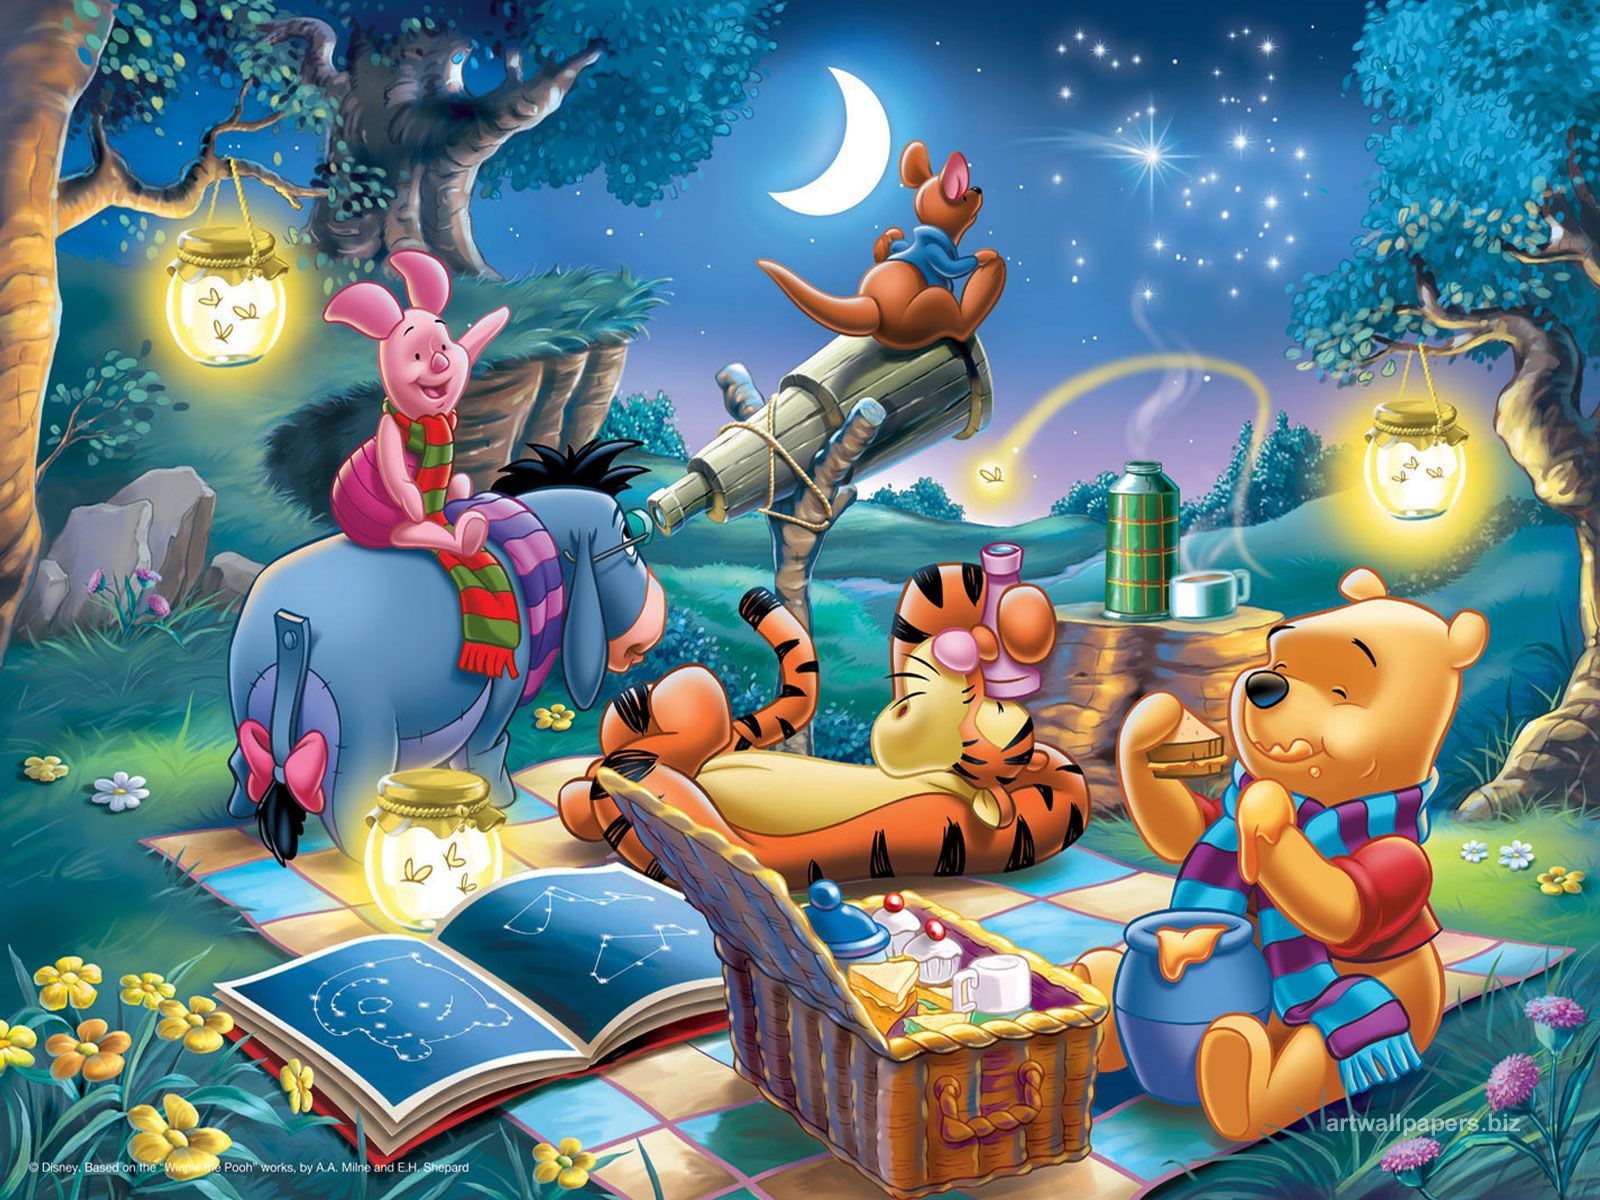 Winnie The Pooh Google Search Cute Winnie The Pooh Winnie The Pooh Winnie The Pooh Friends